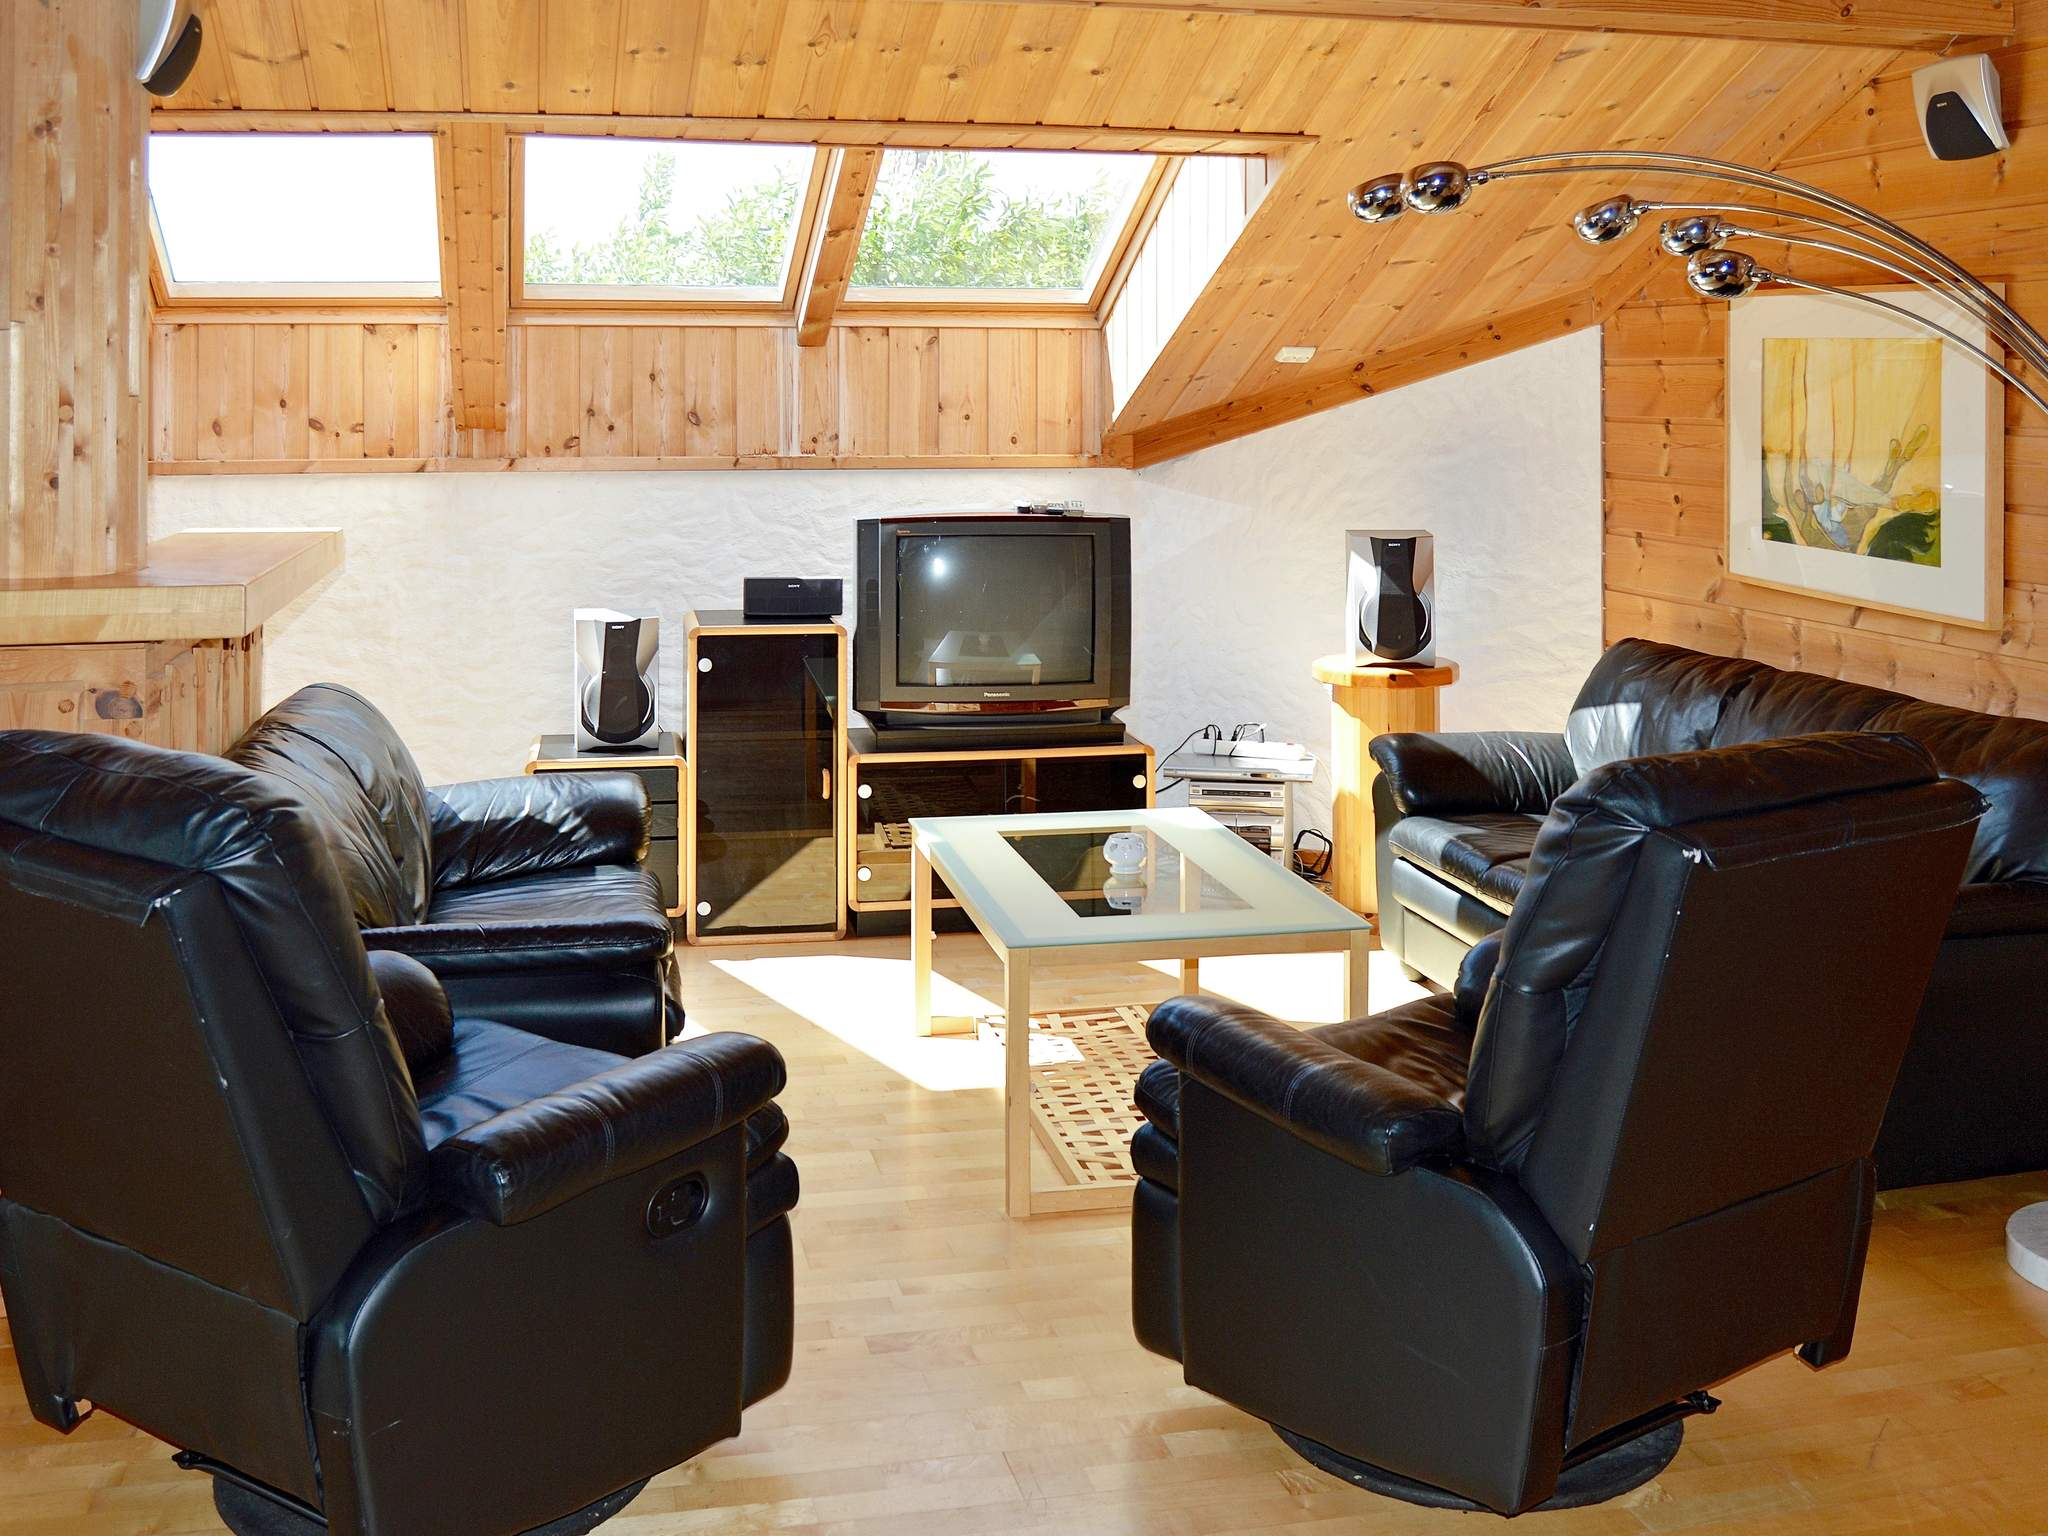 Ferienhaus Eidsvåg (84695), Eidsvåg, More - Romsdal, Westnorwegen, Norwegen, Bild 6